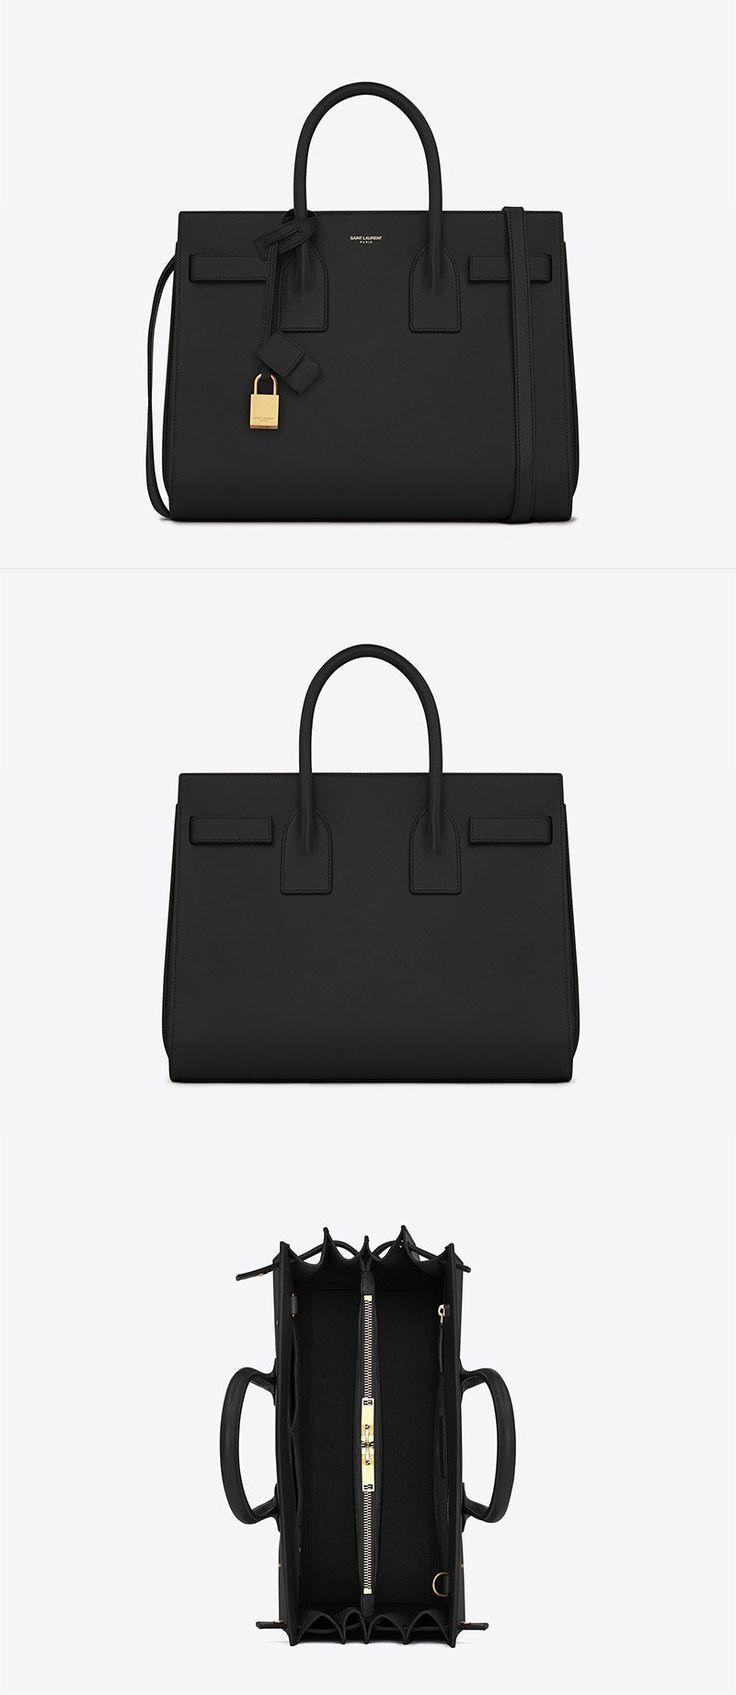 Saint Laurent Sac Du Jour | Monogram Crossbody | Yves Saint Laurent Handbags